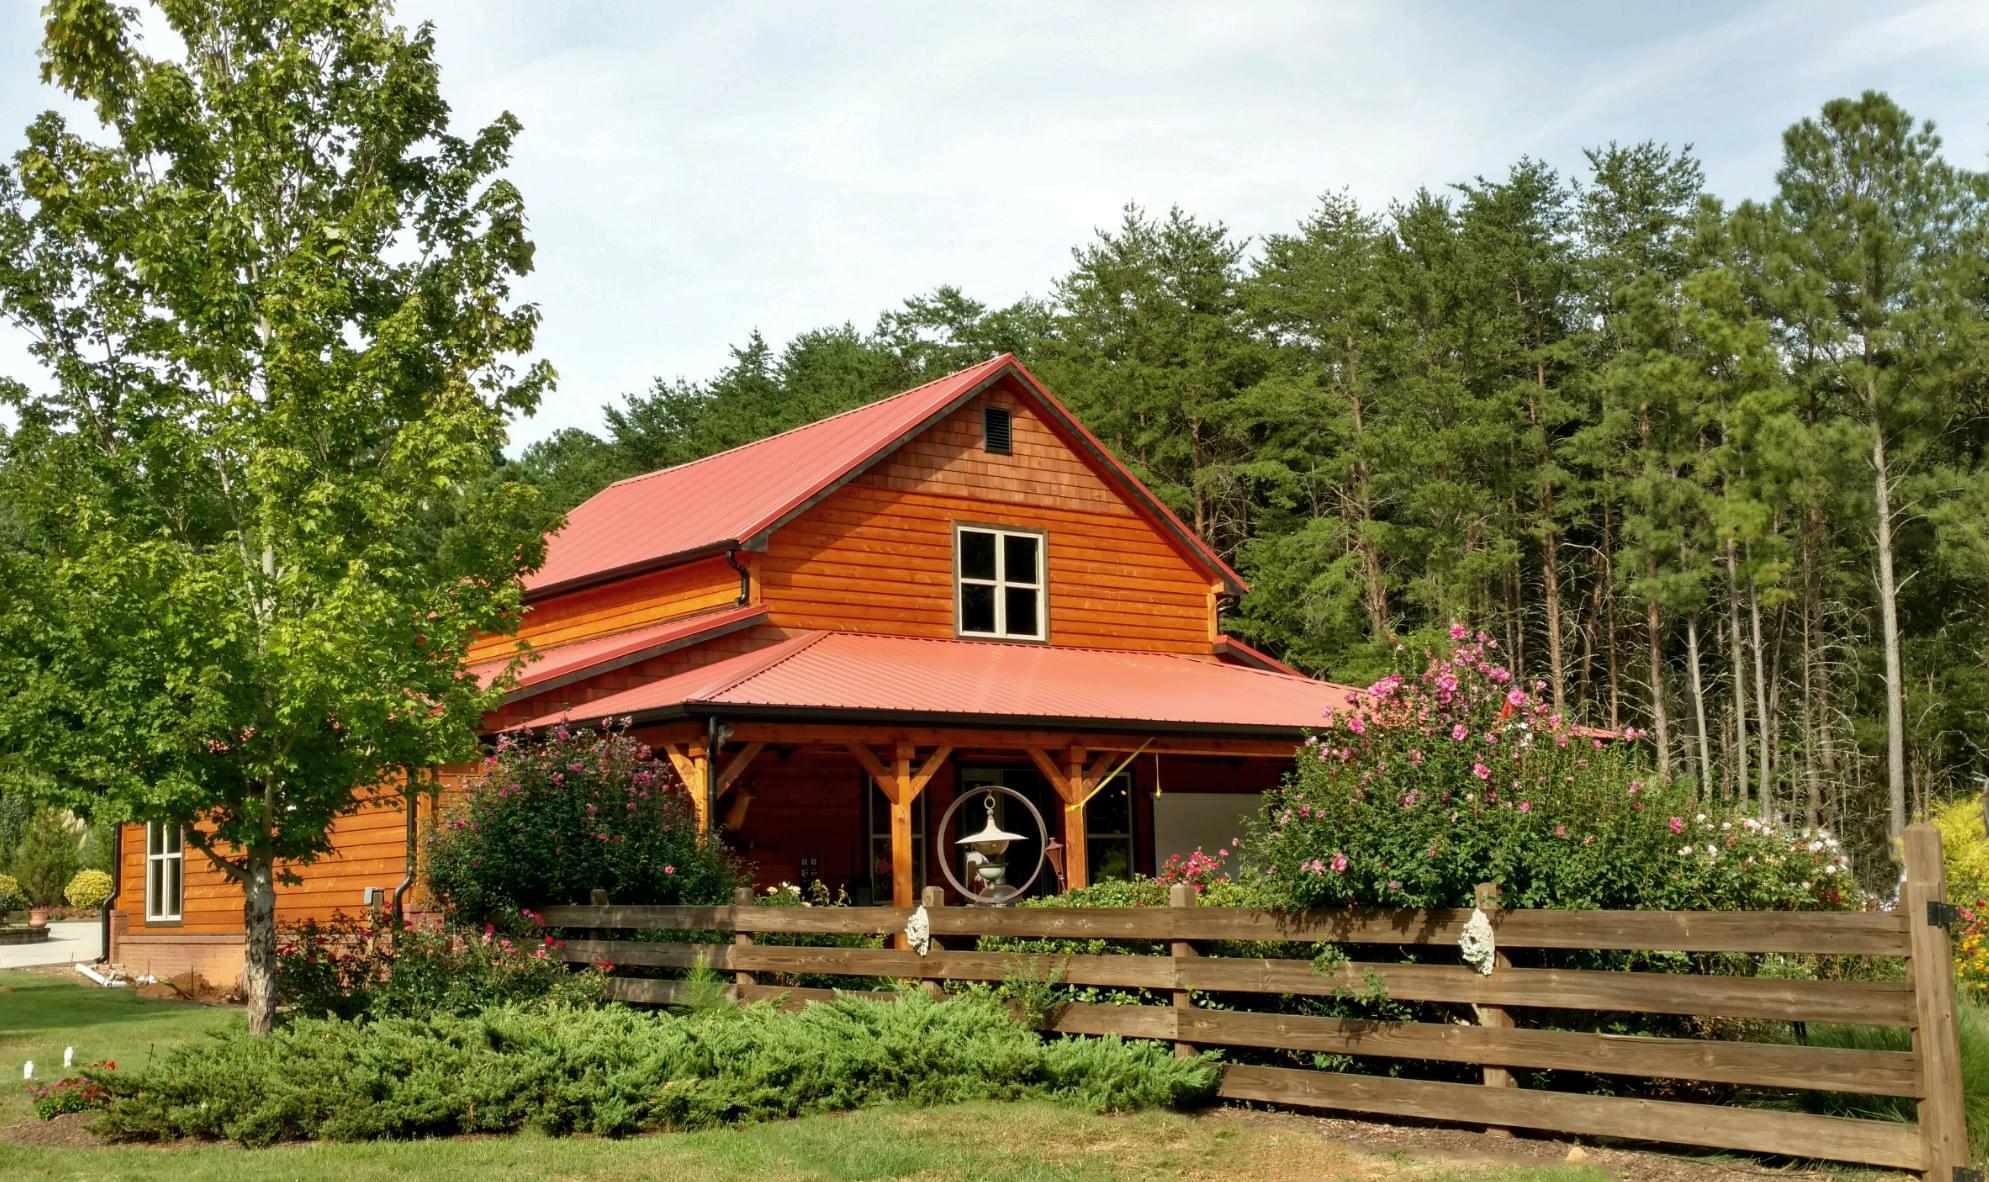 residential metal roof red